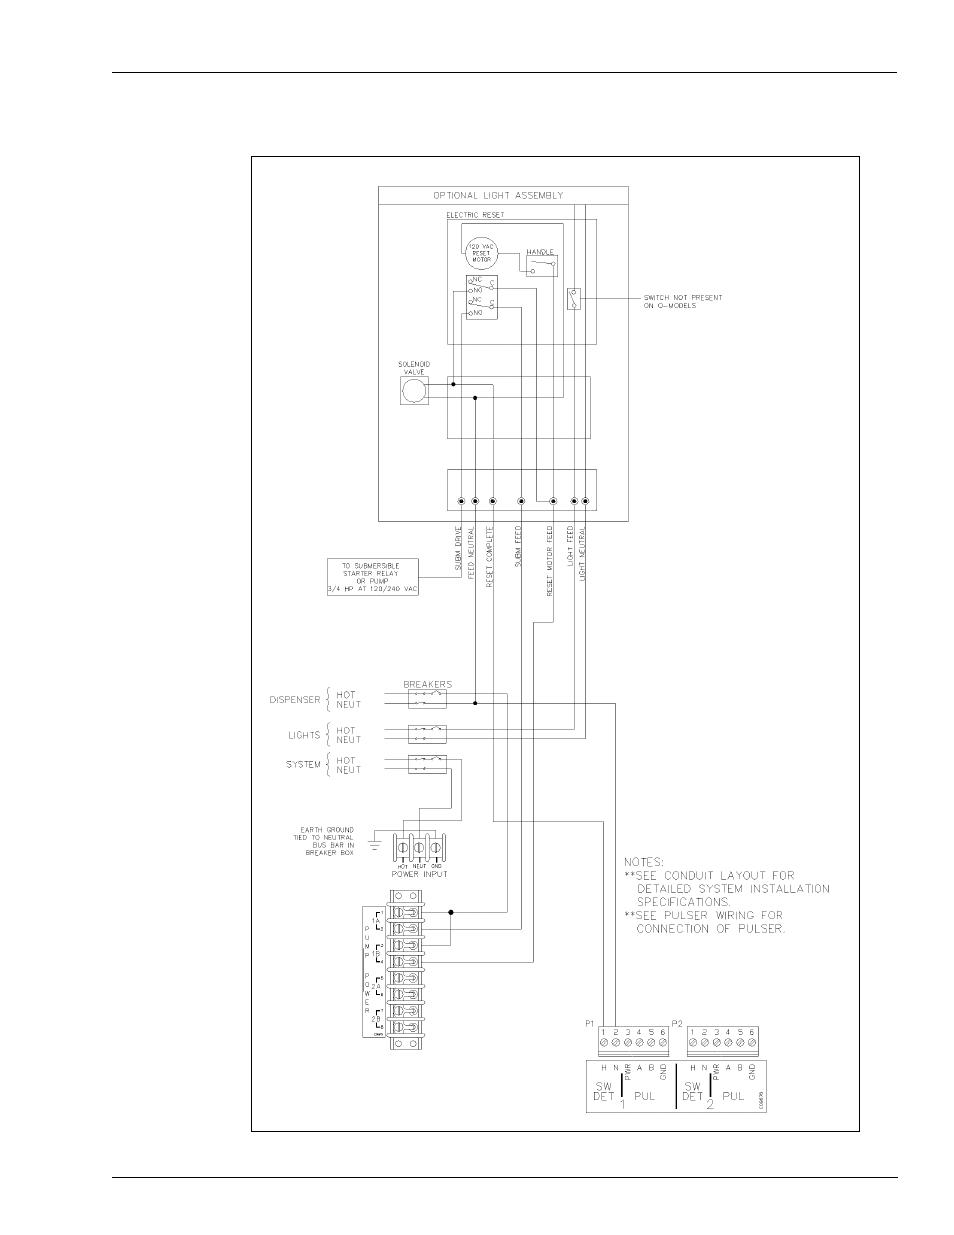 Gasboy Pump Wiring Diagram - Fusebox and Wiring Diagram circuit-bacon -  circuit-bacon.parliamoneassieme.it | Hydrodynamic 1081 Pool Pump Wiring Diagram |  | diagram database